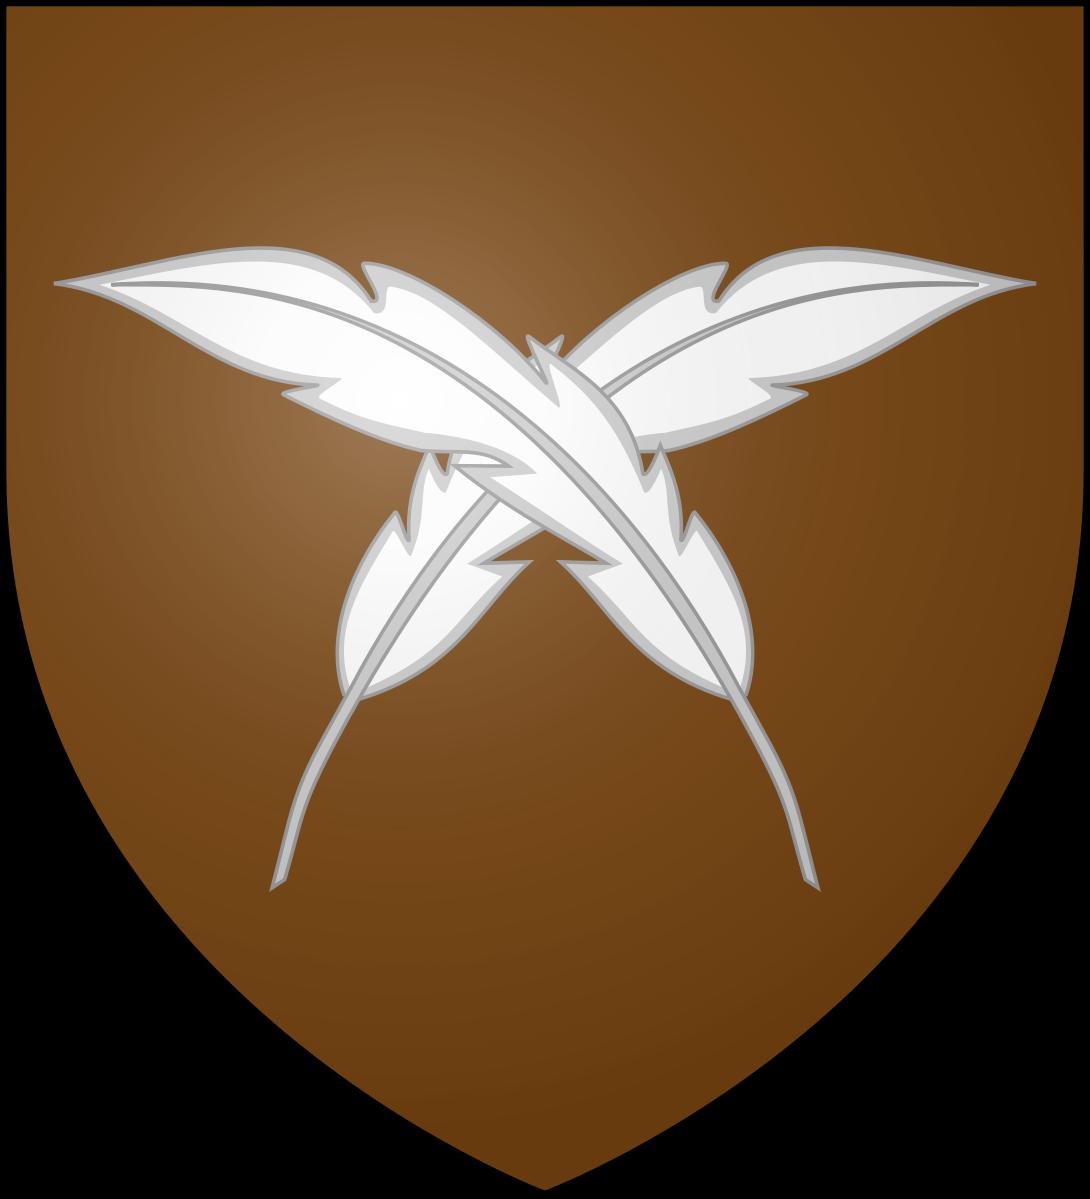 Aelinor Fünfrosen